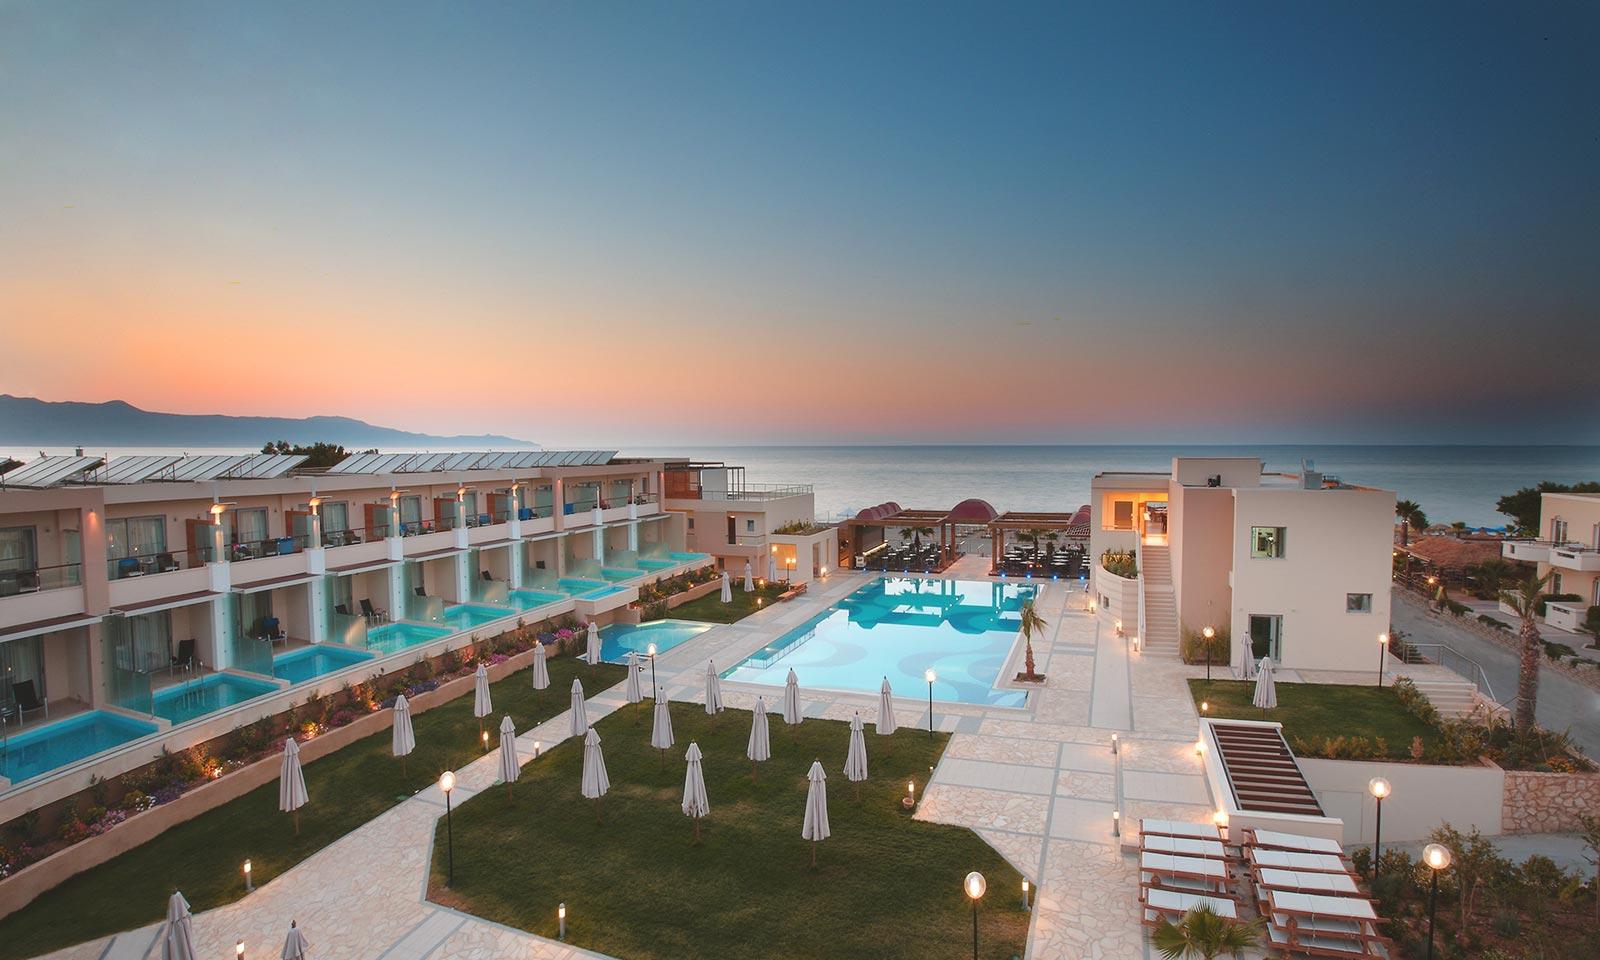 Creta resort lusso aldemar knossos royal villas albergo for Design hotel kreta